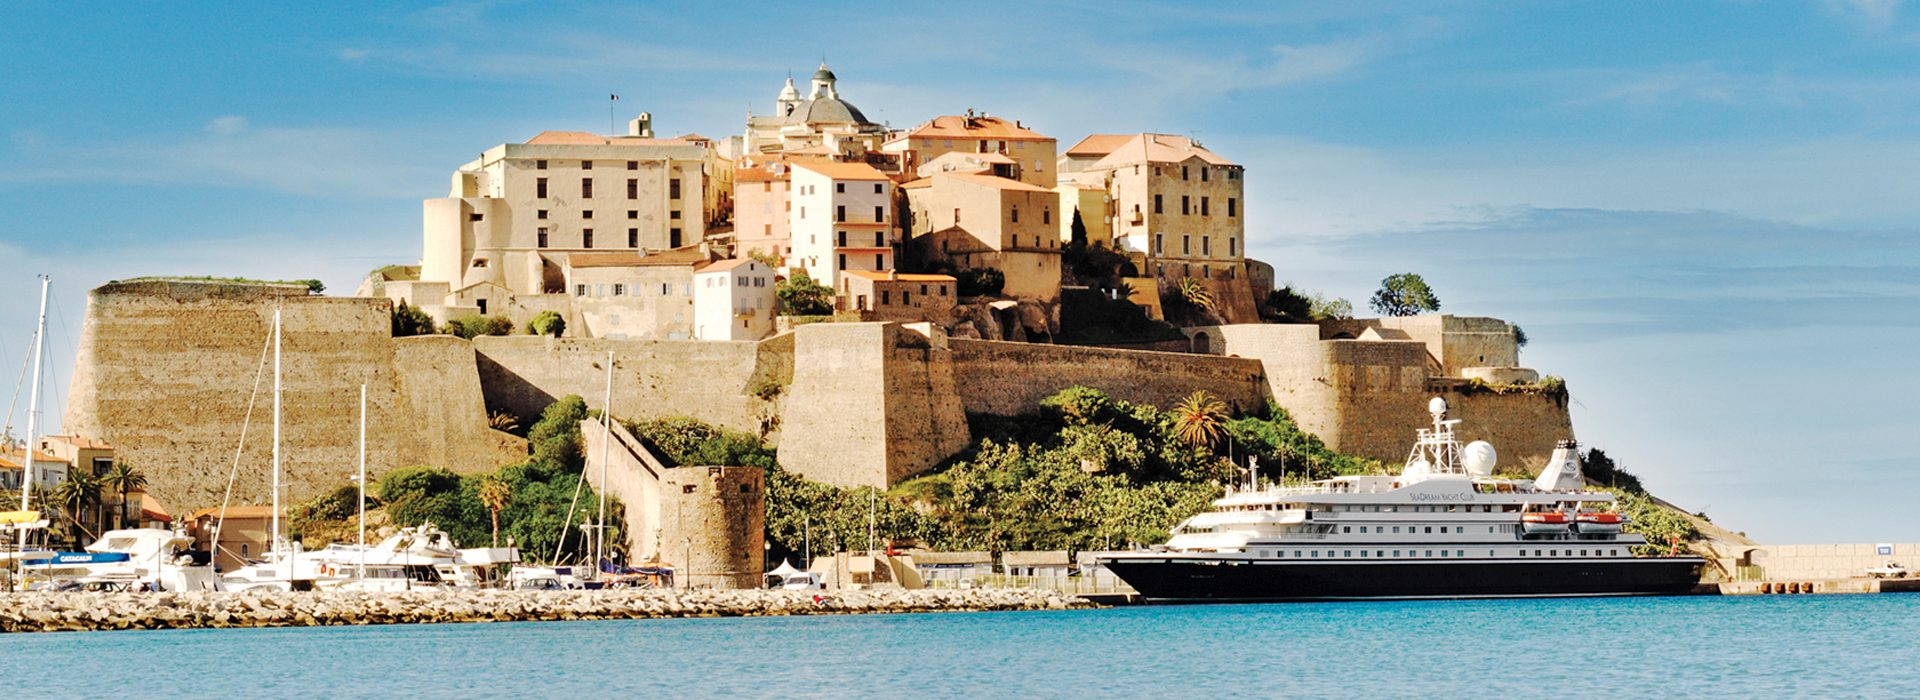 SeaDream_Intimate_Ports_and_Harbors-Bonifacio